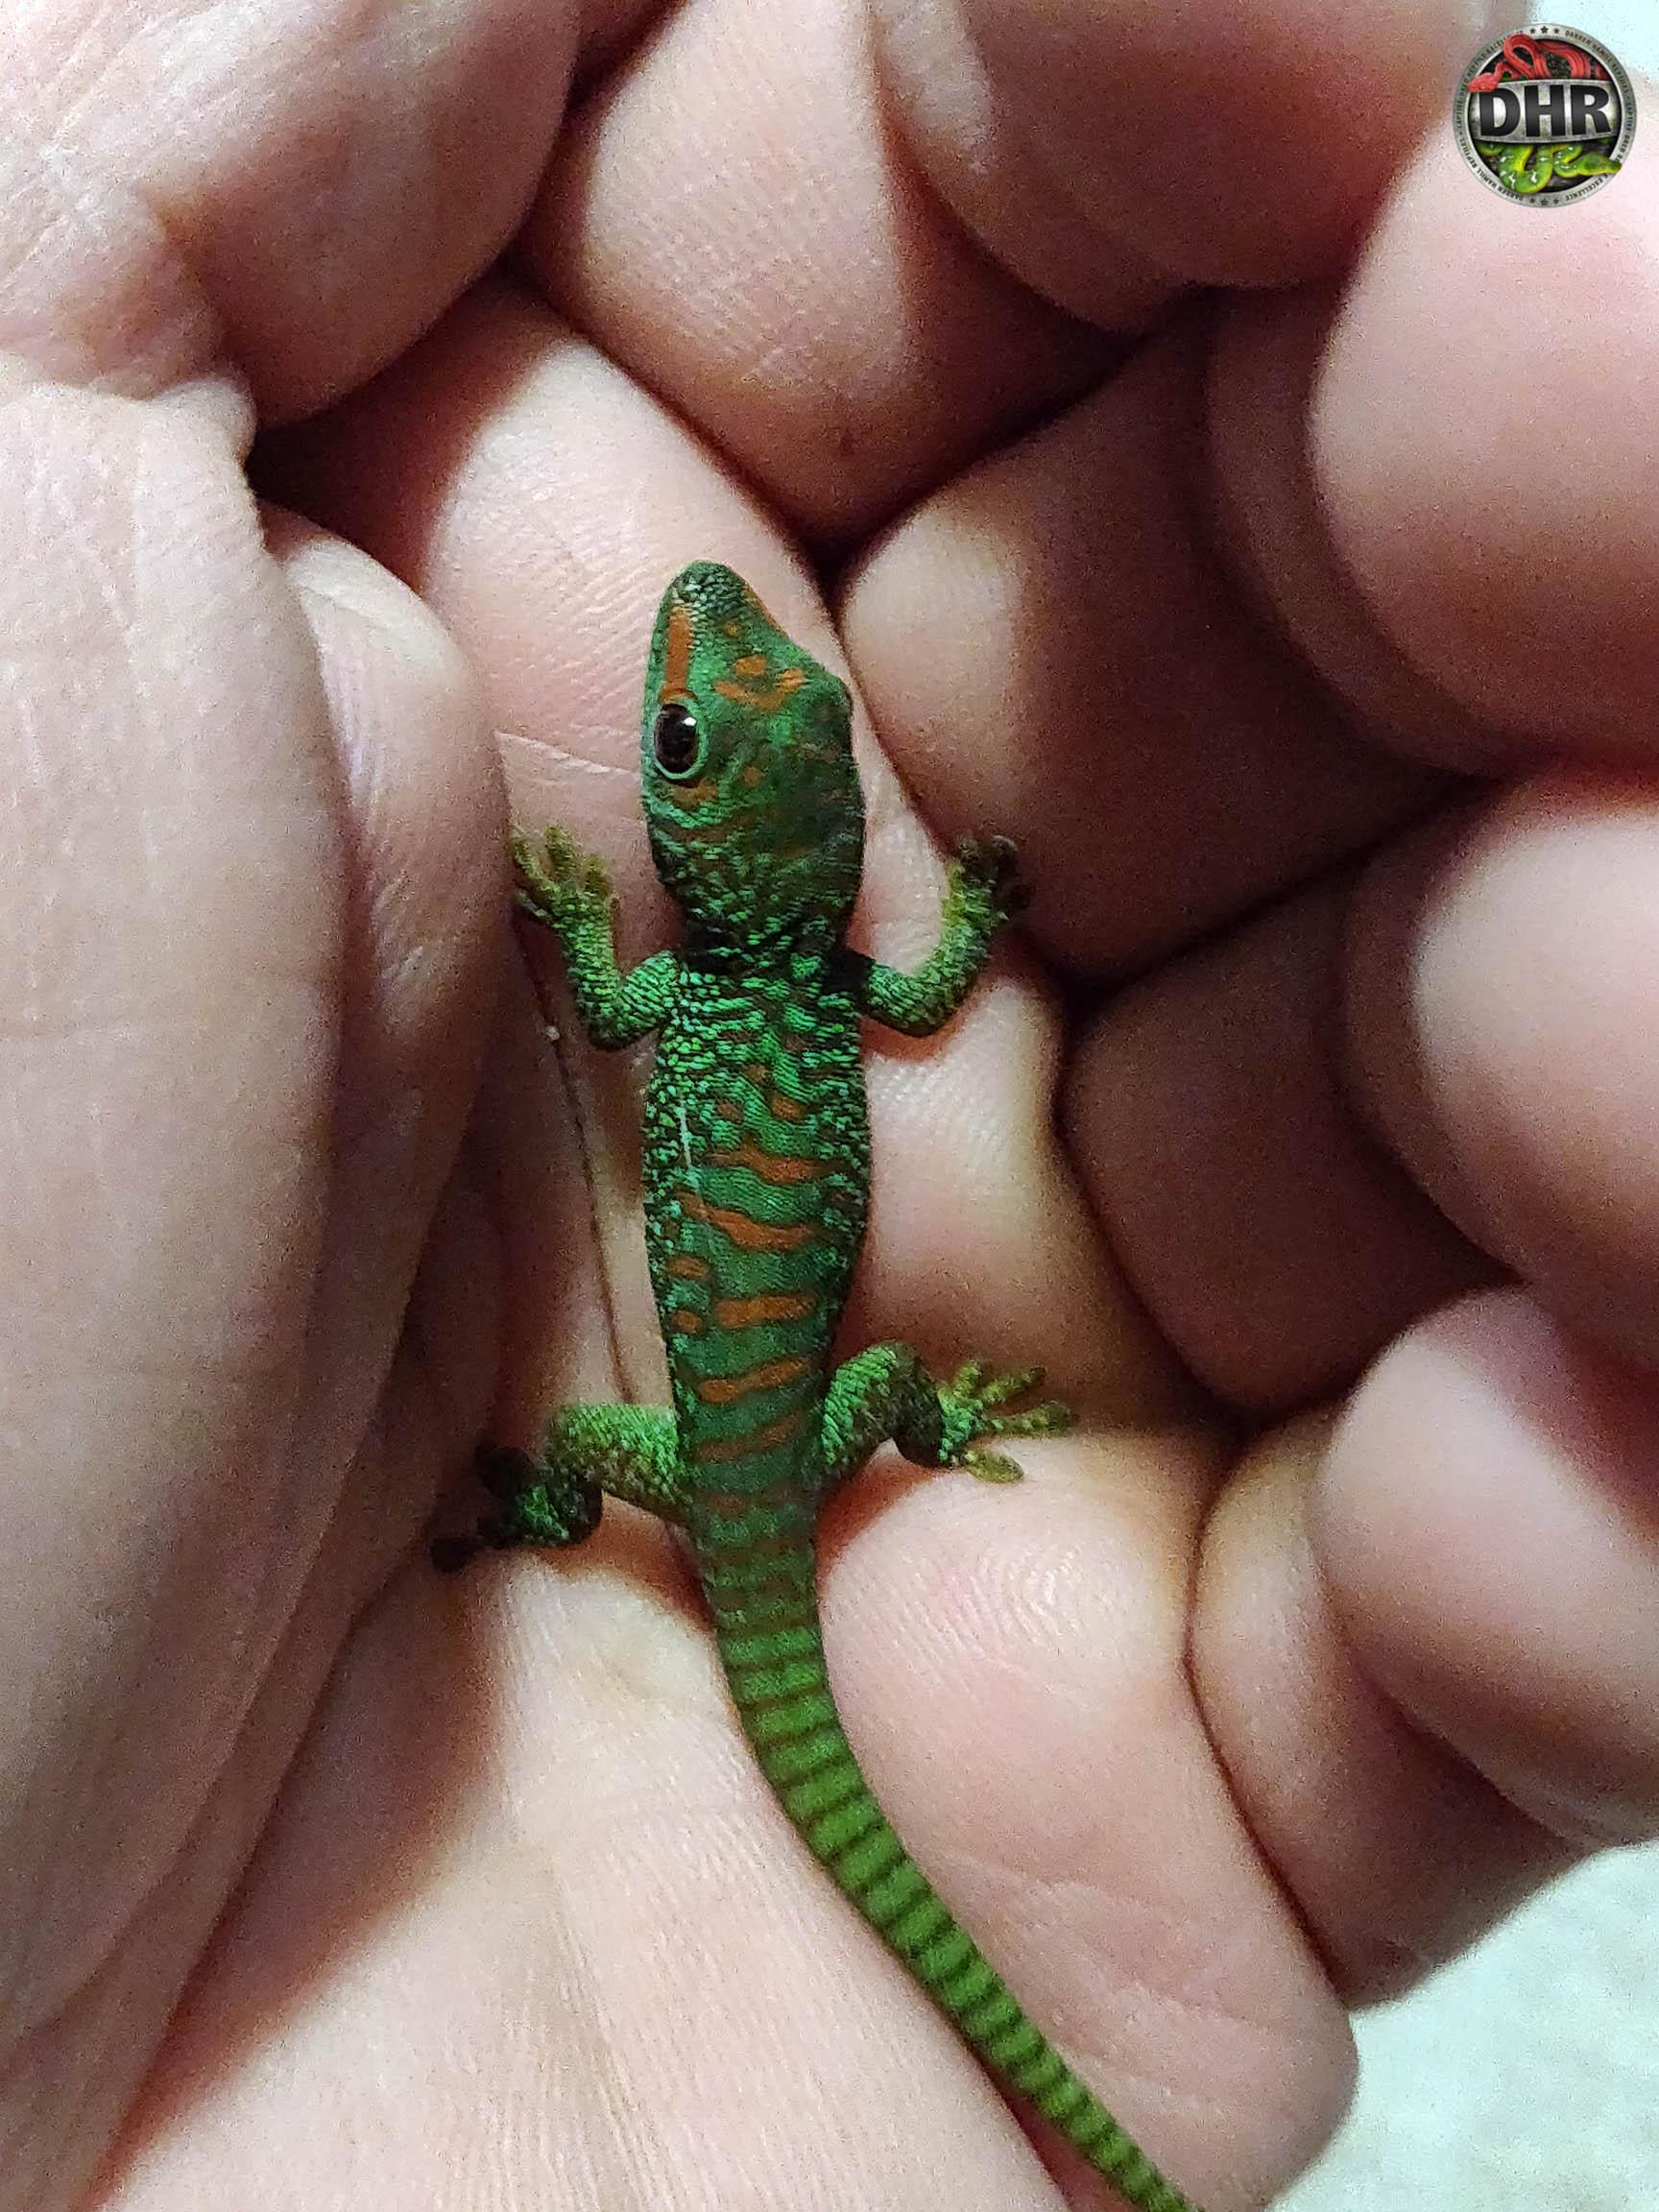 Madagascan Giant Day Gecko (Phelsuma grandis)